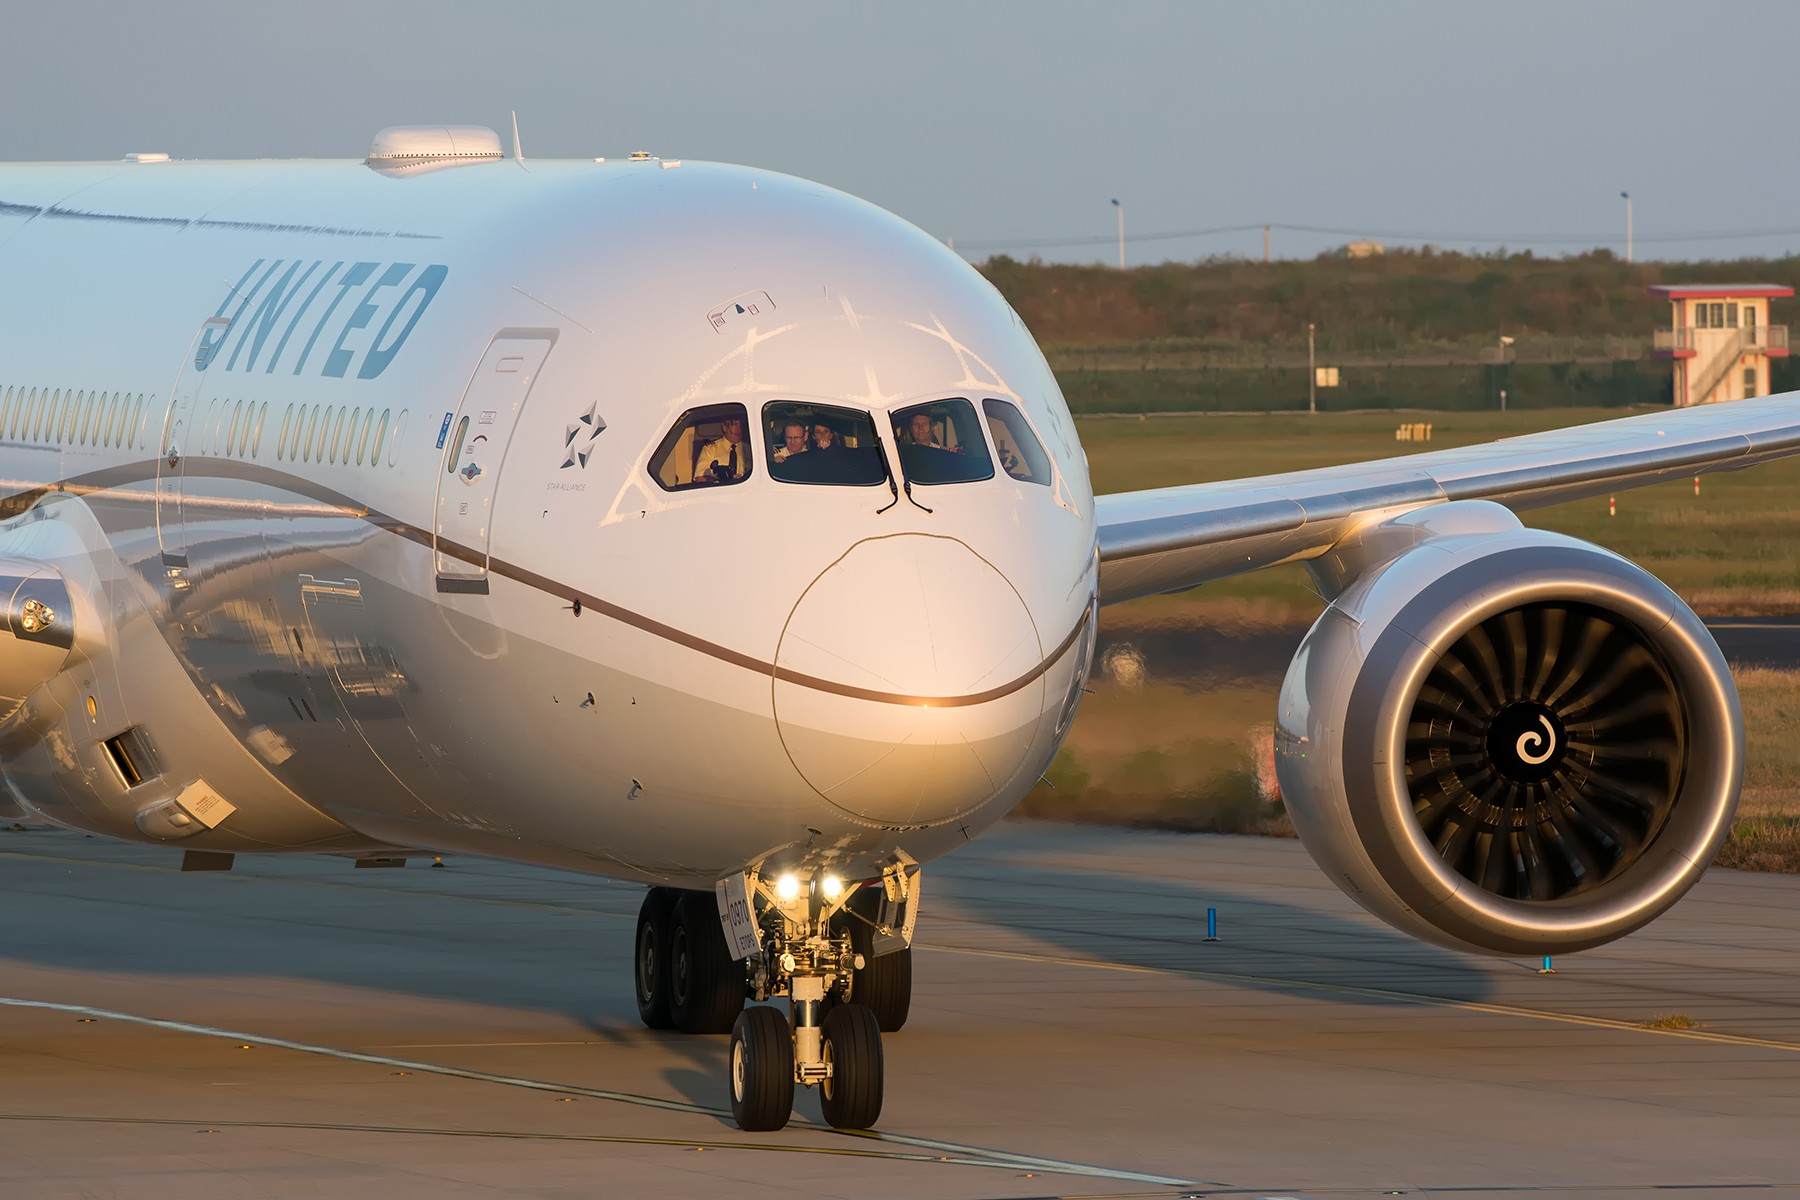 【PVG】一图党之美联航789 BOEING 787-9 N26970 中国上海浦东国际机场